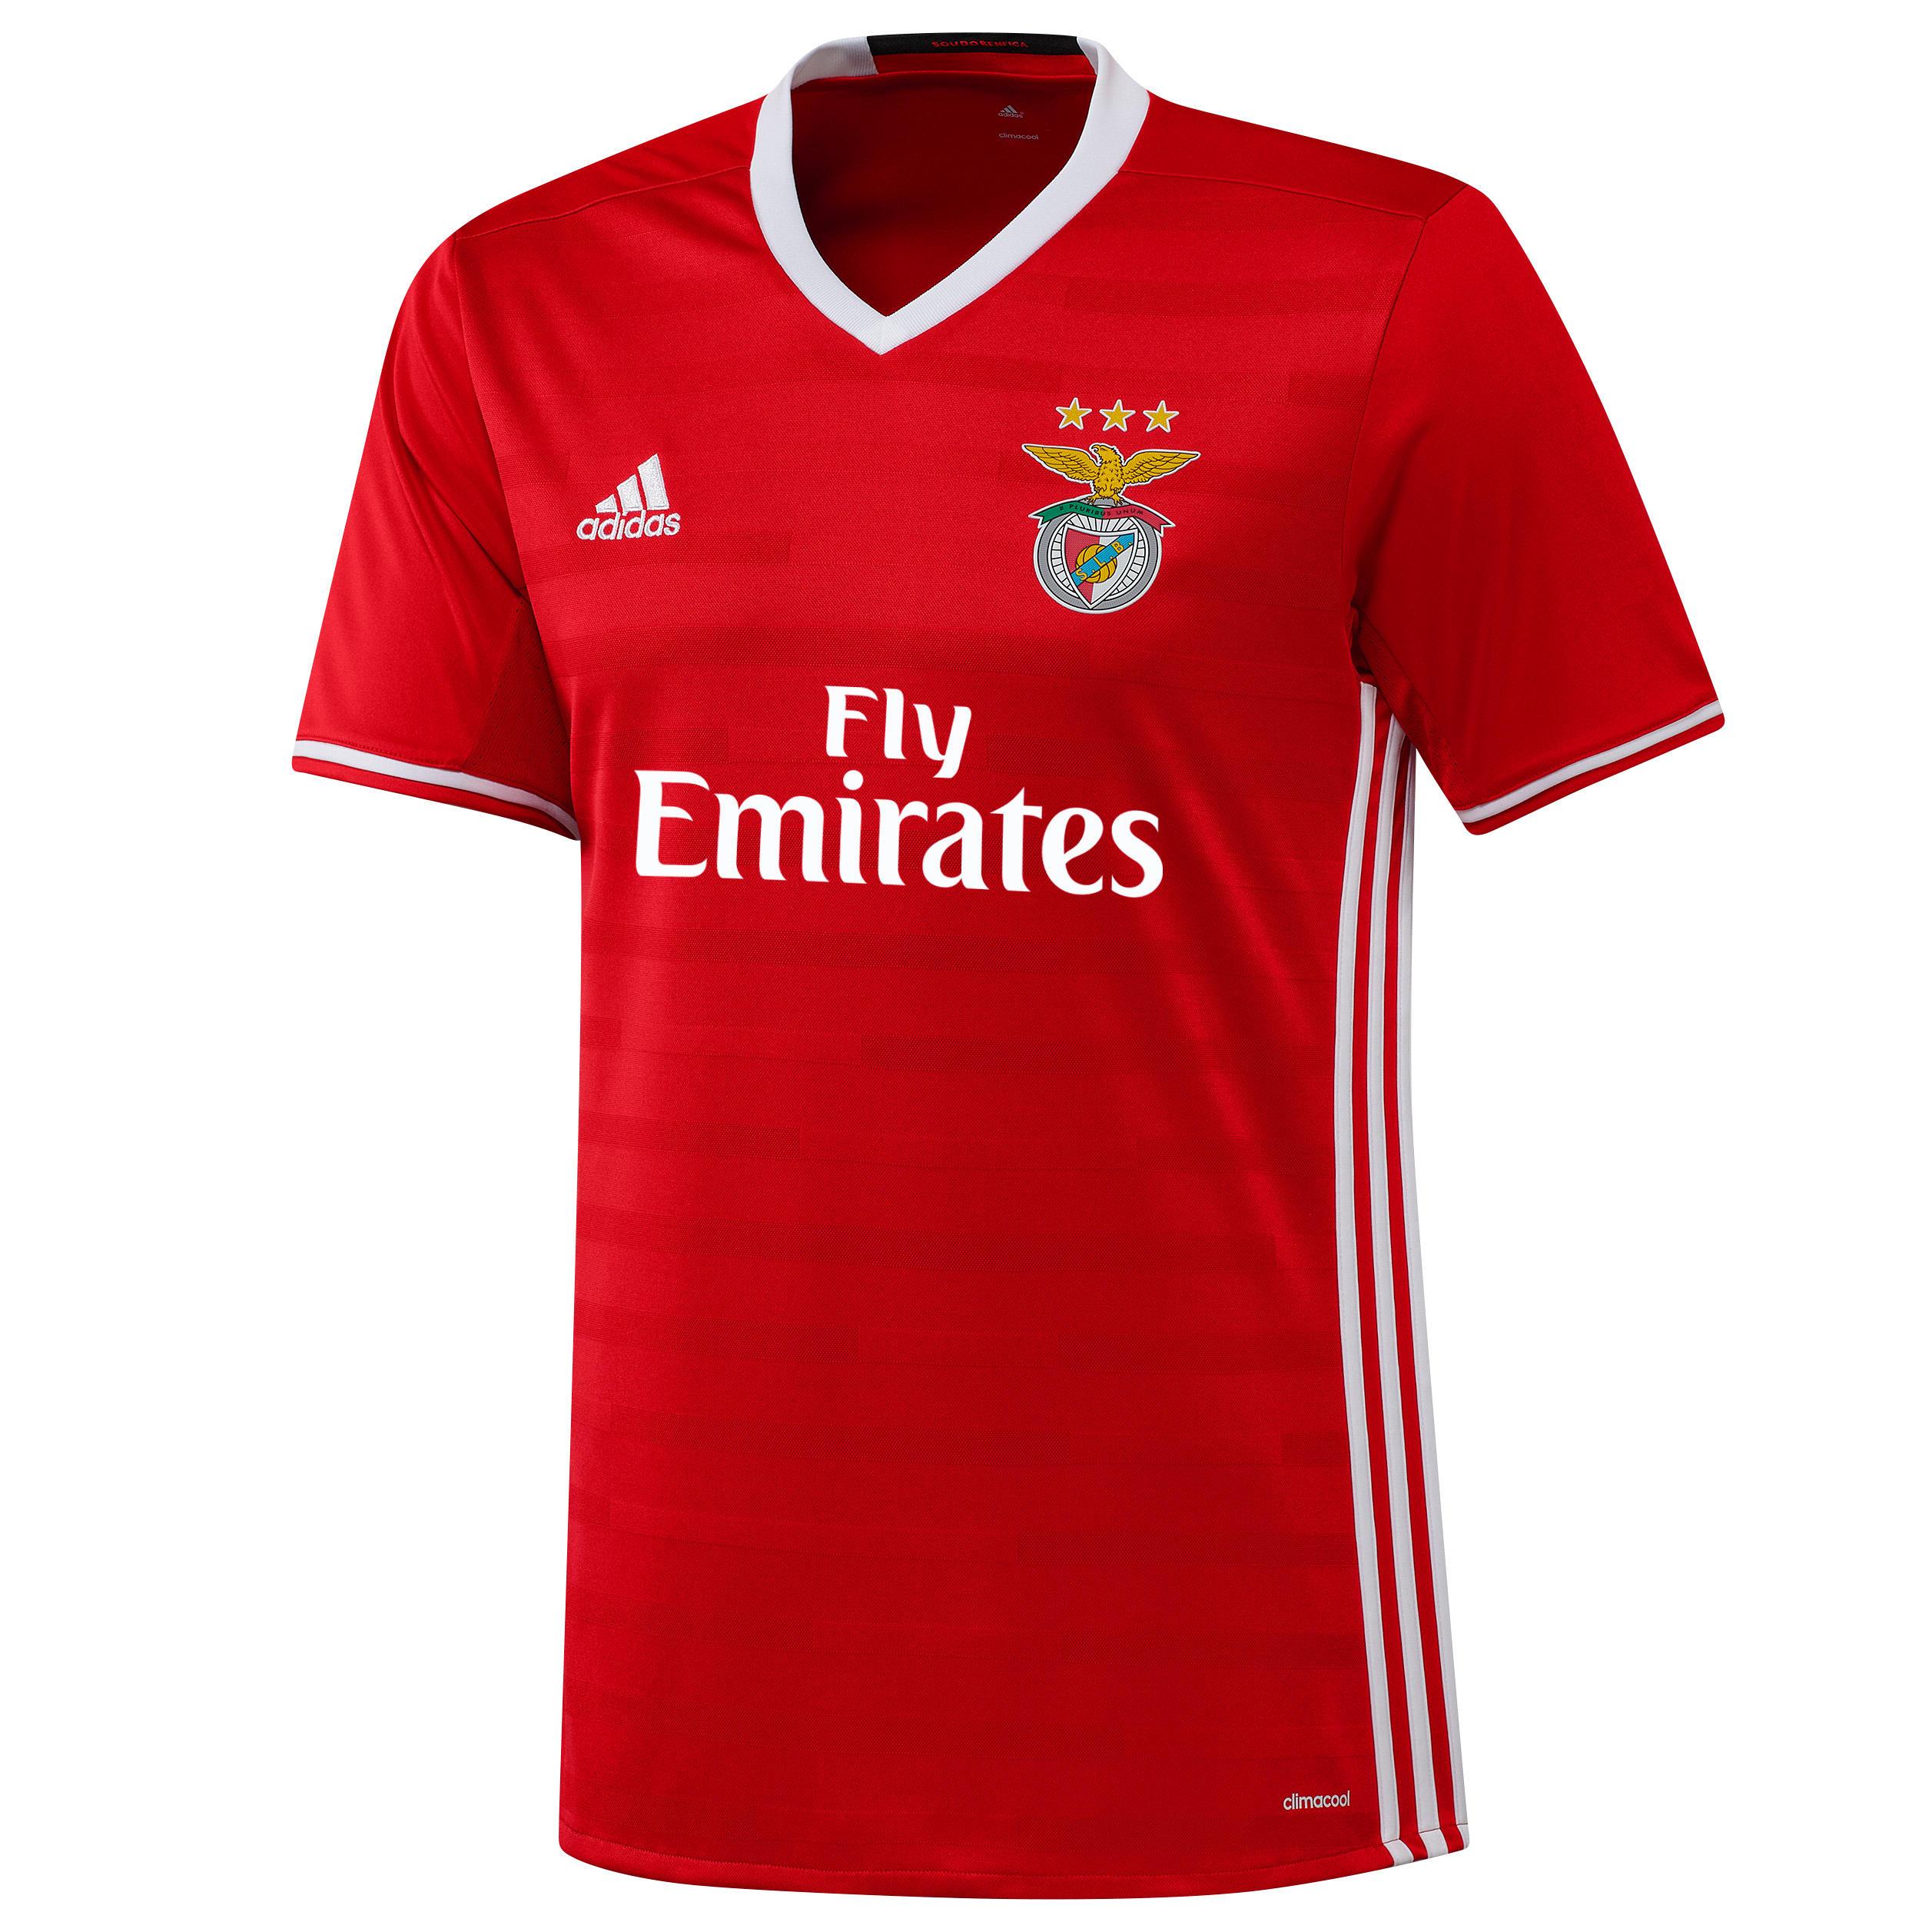 Adidas Voetbalshirt Benfica thuisshirt kinderen rood